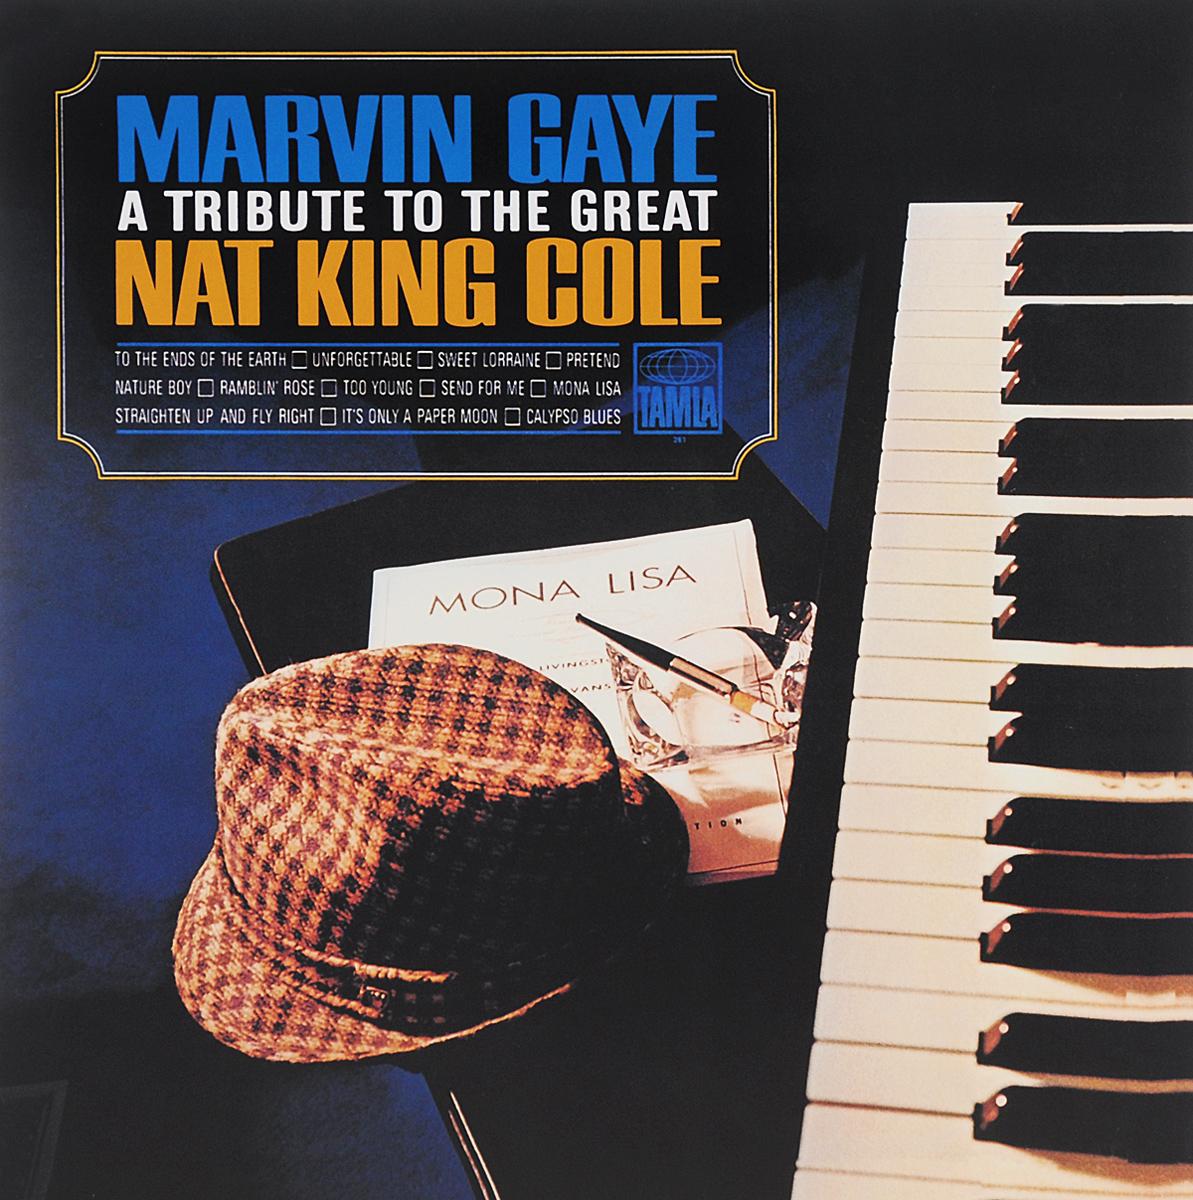 Марвин Гэй Marvin Gaye. A Tribute To The Great Nat King Cole (LP) марвин гэй marvin gaye volume jne 1961 1965 7 lp